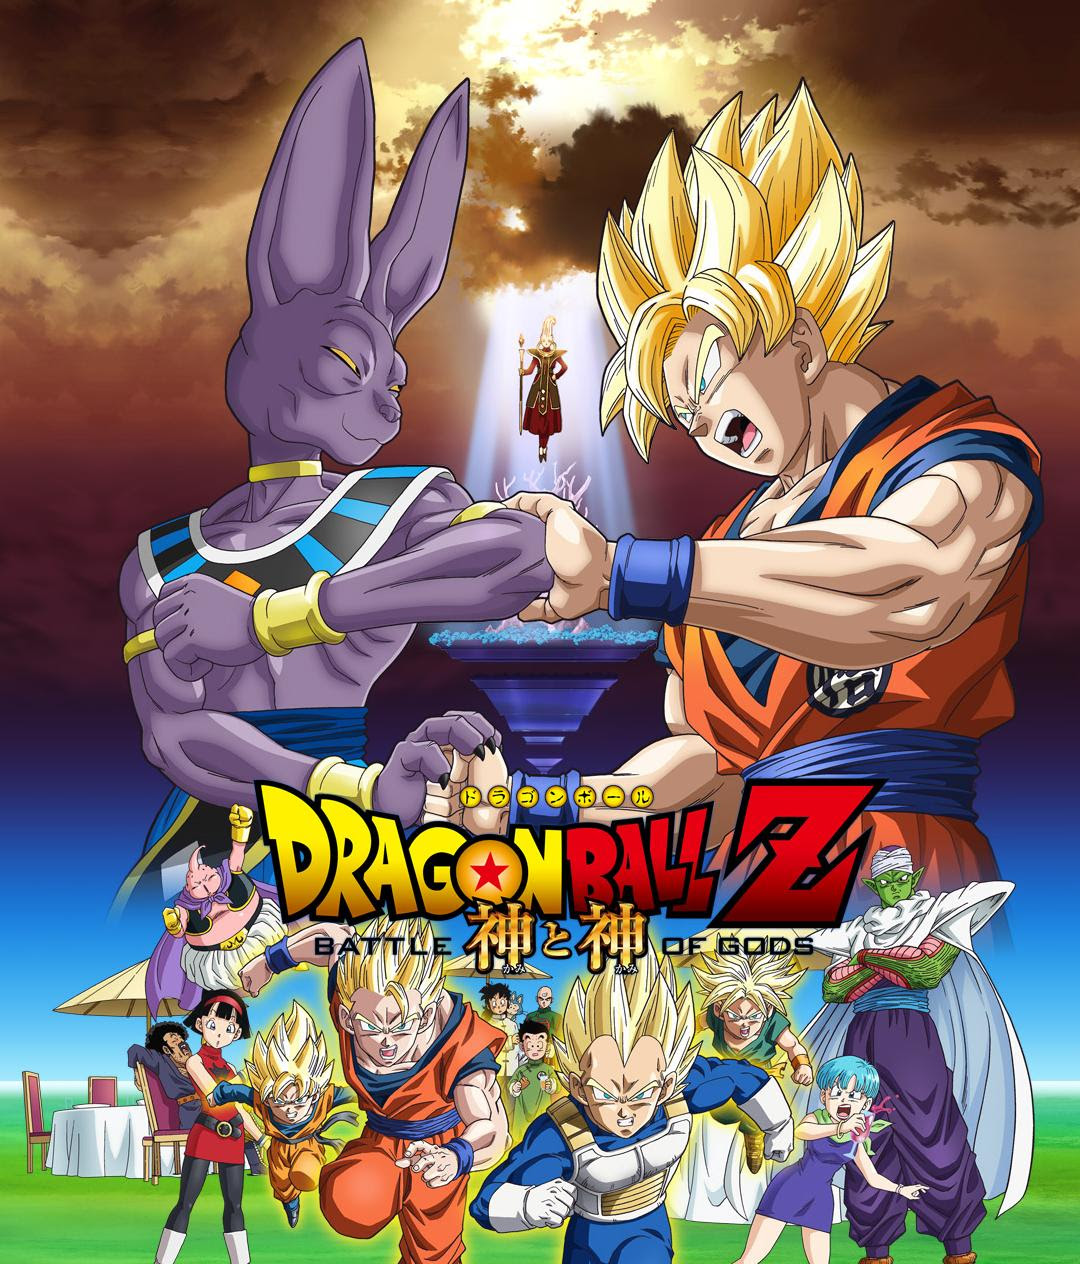 póster dragon ball z la batalla de los dioses